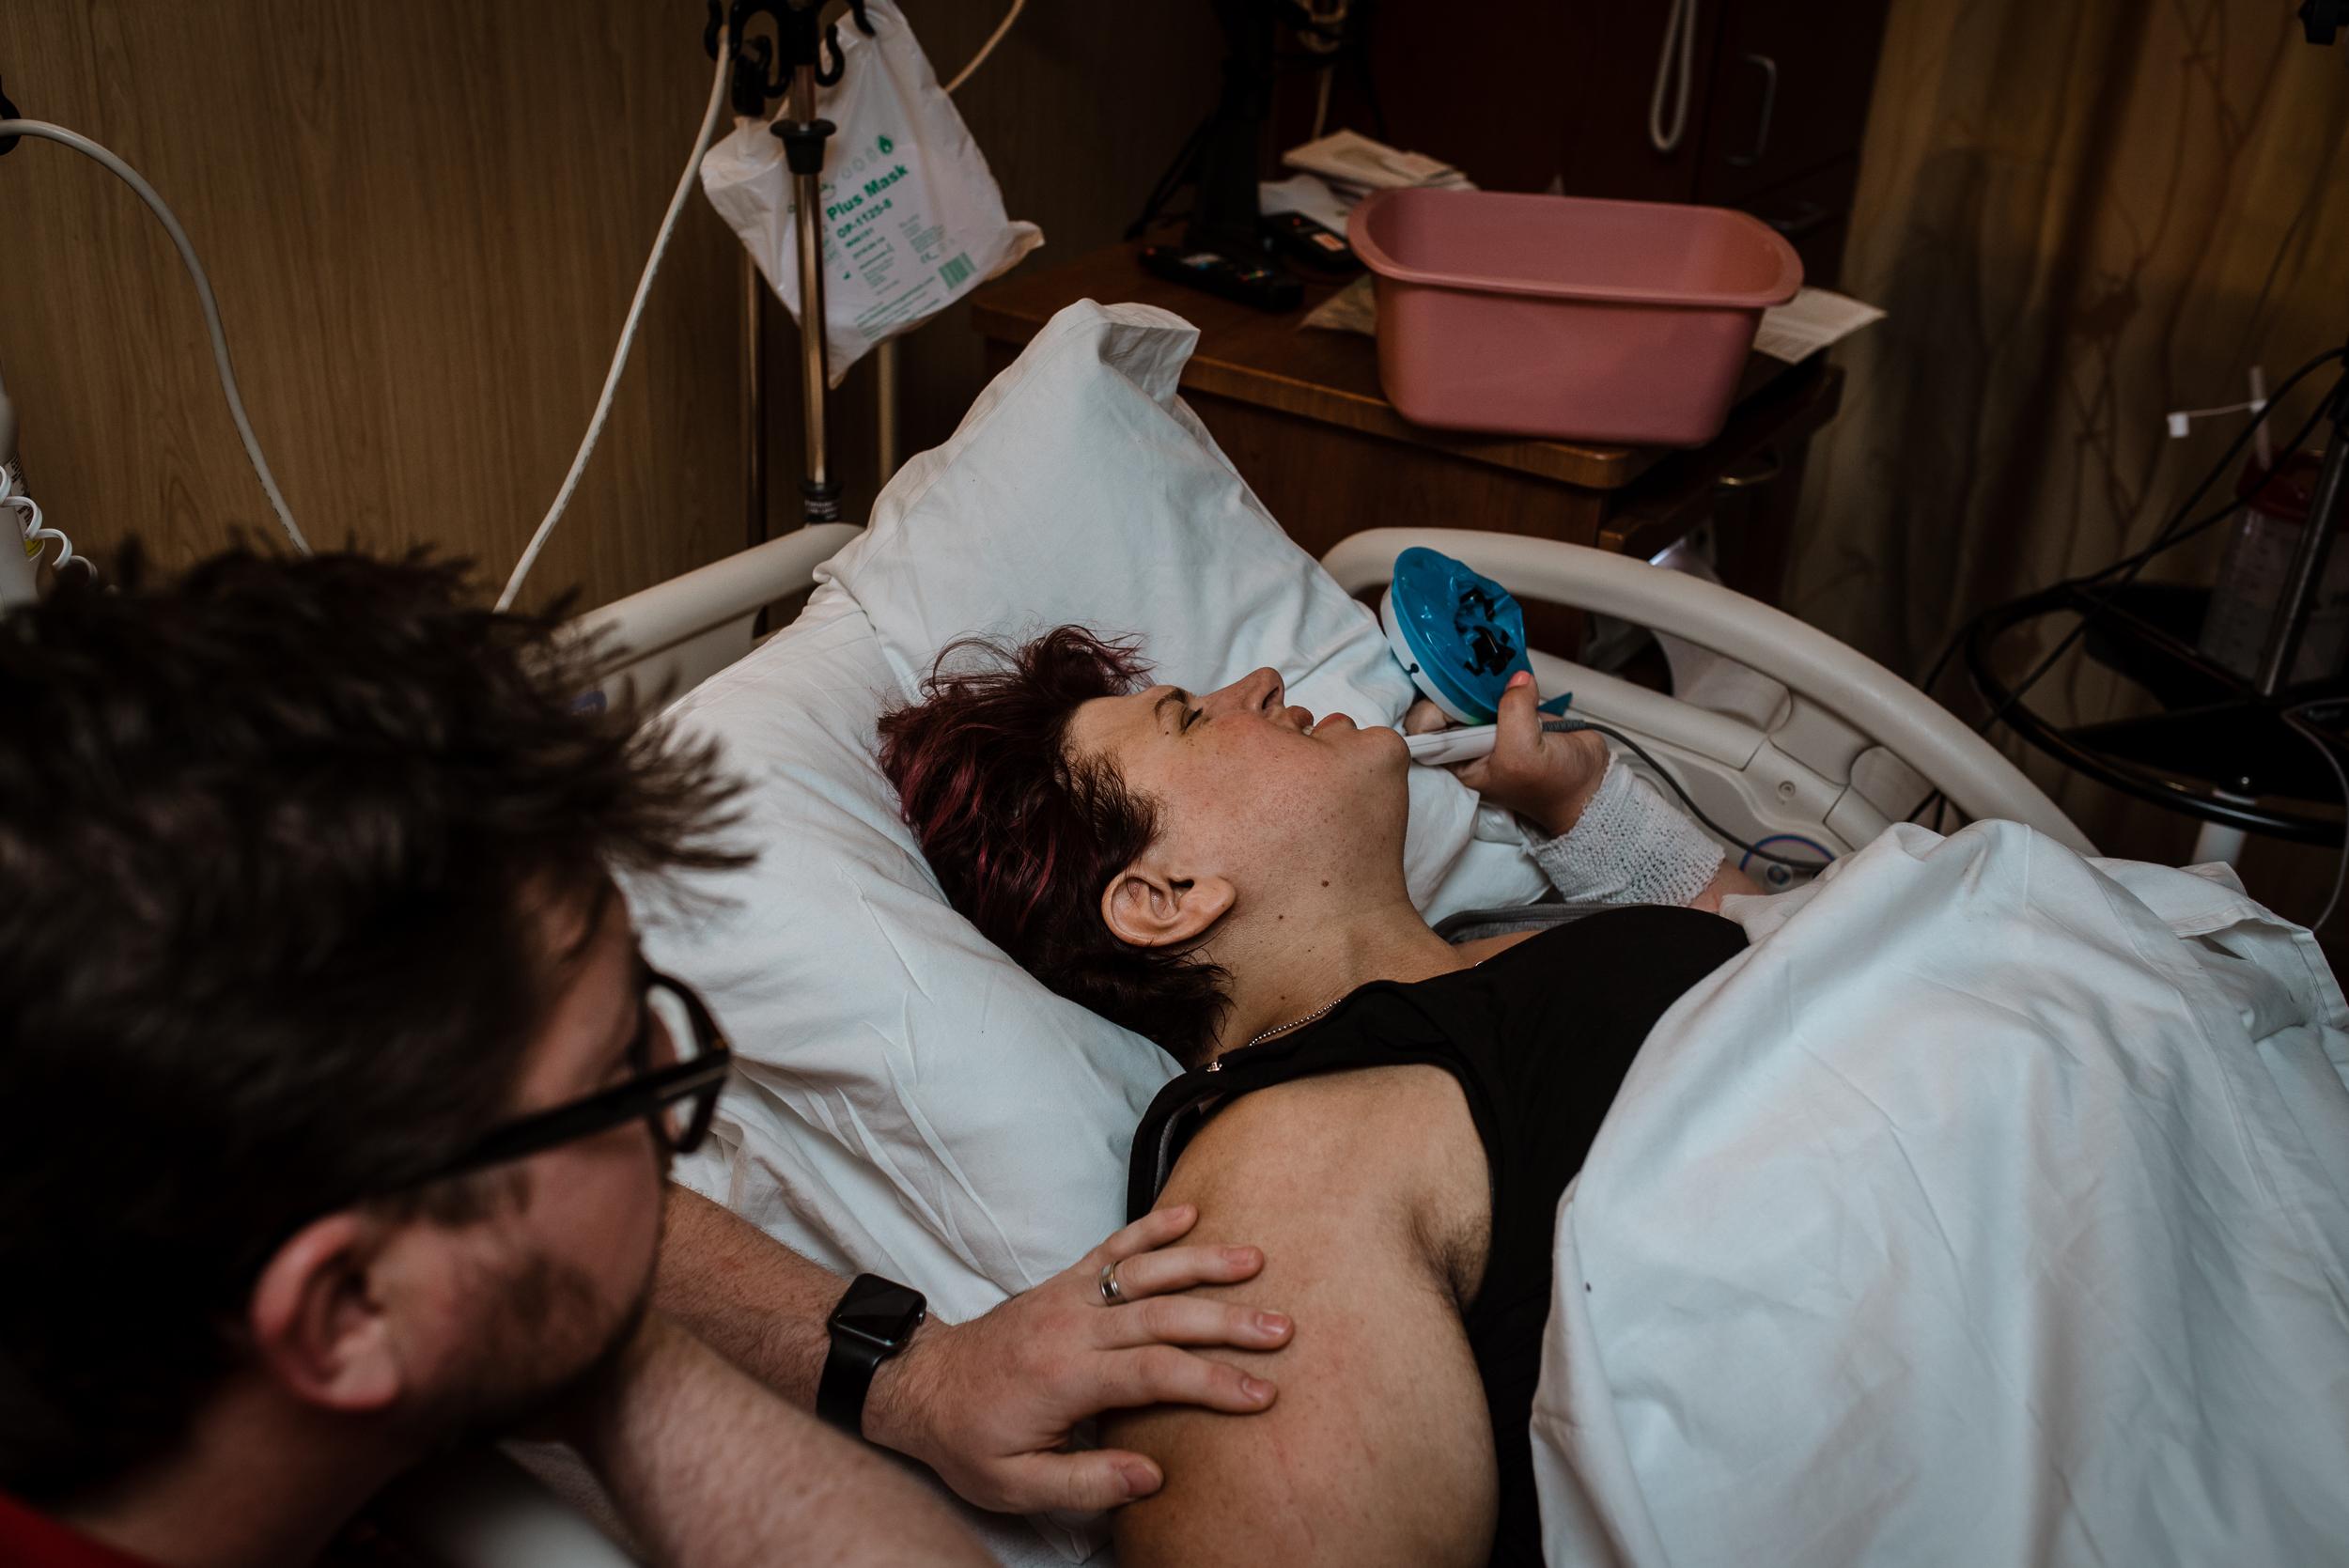 Meredith Westin Photography- Minneapolis Birth Stories and Films-November 08, 2018-145043.jpg